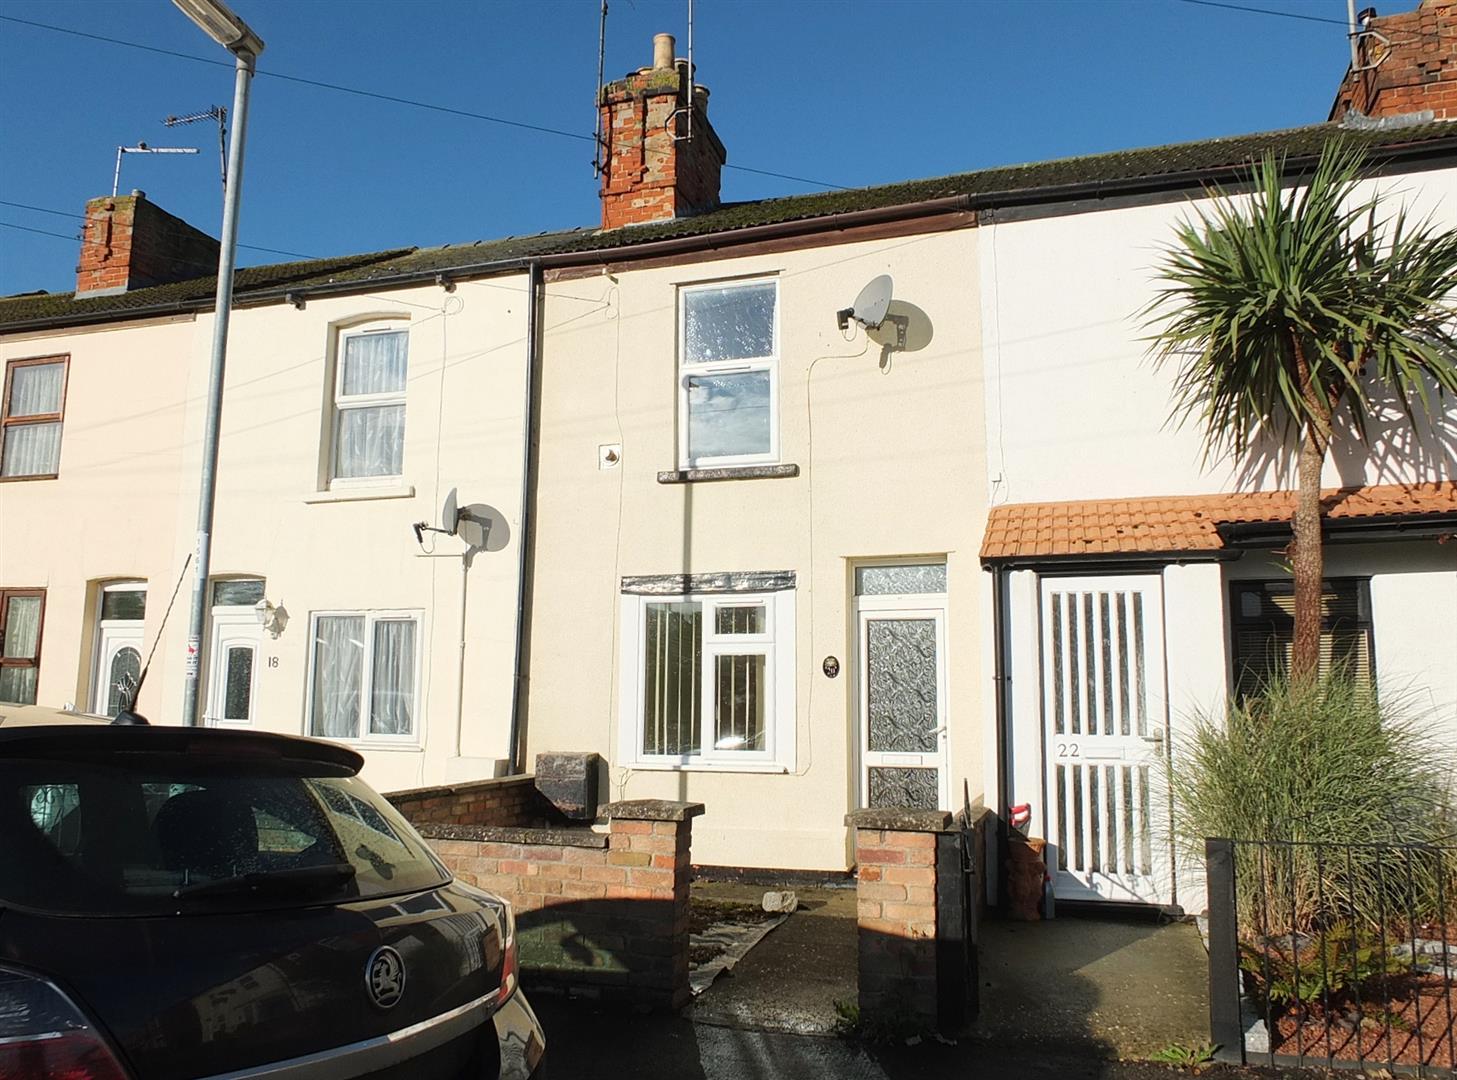 2 bed terraced house for sale in Granville Terrace, Sutton Bridge Spalding, PE12